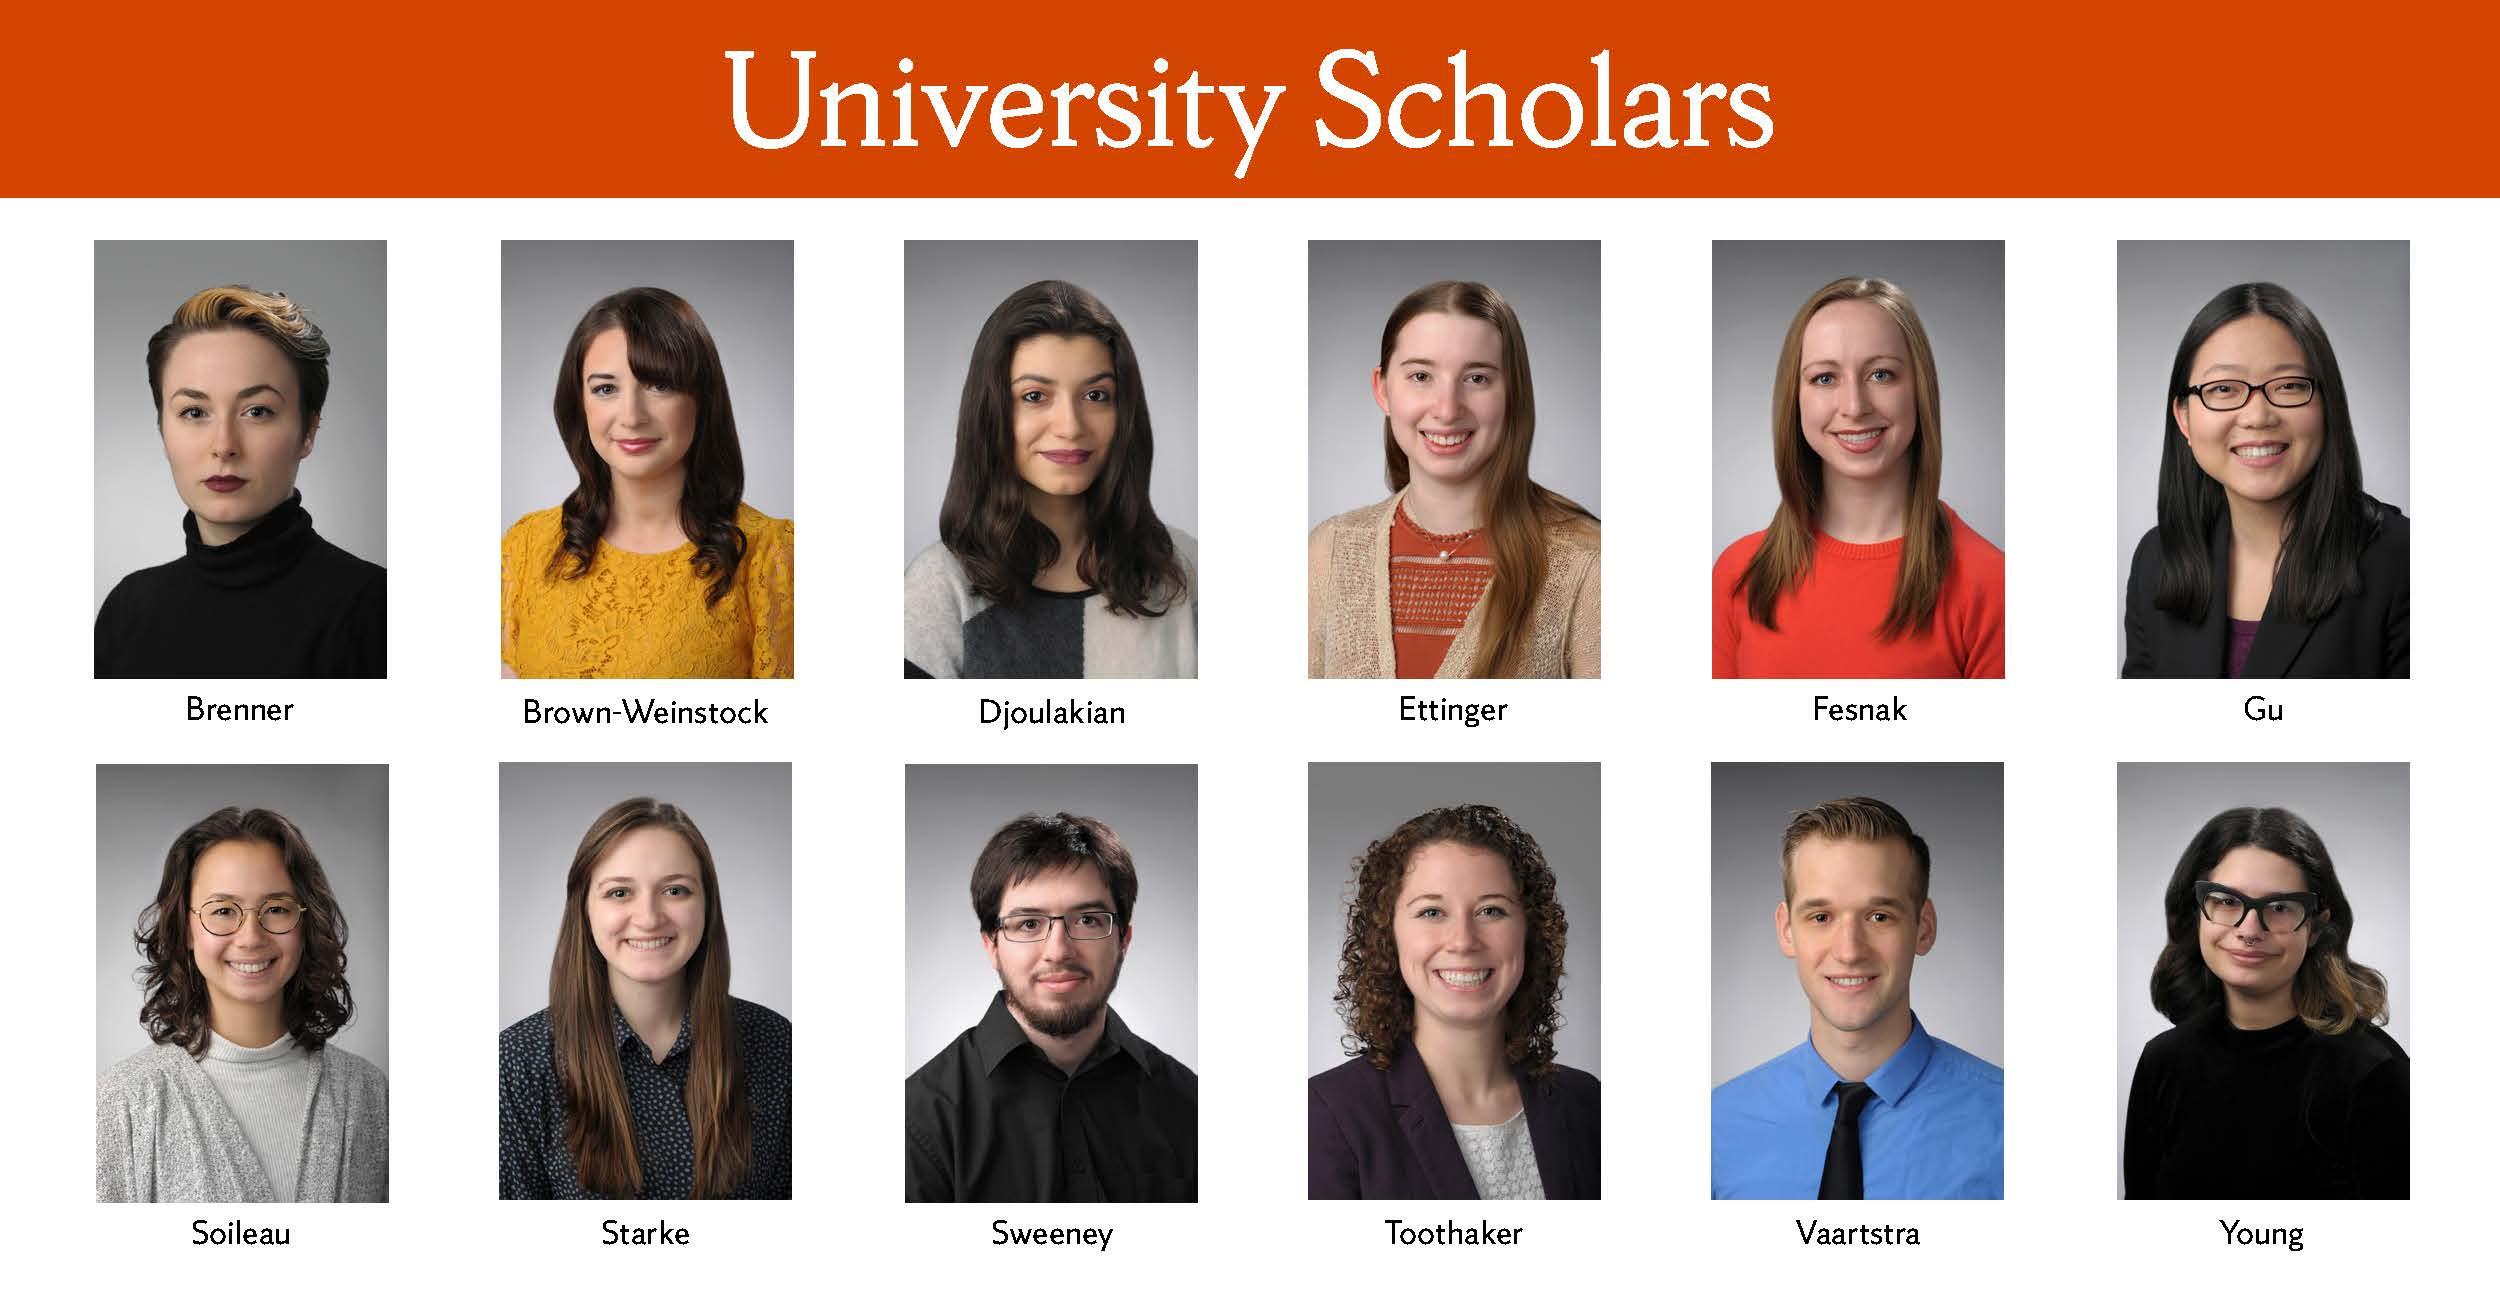 University Scholars photos